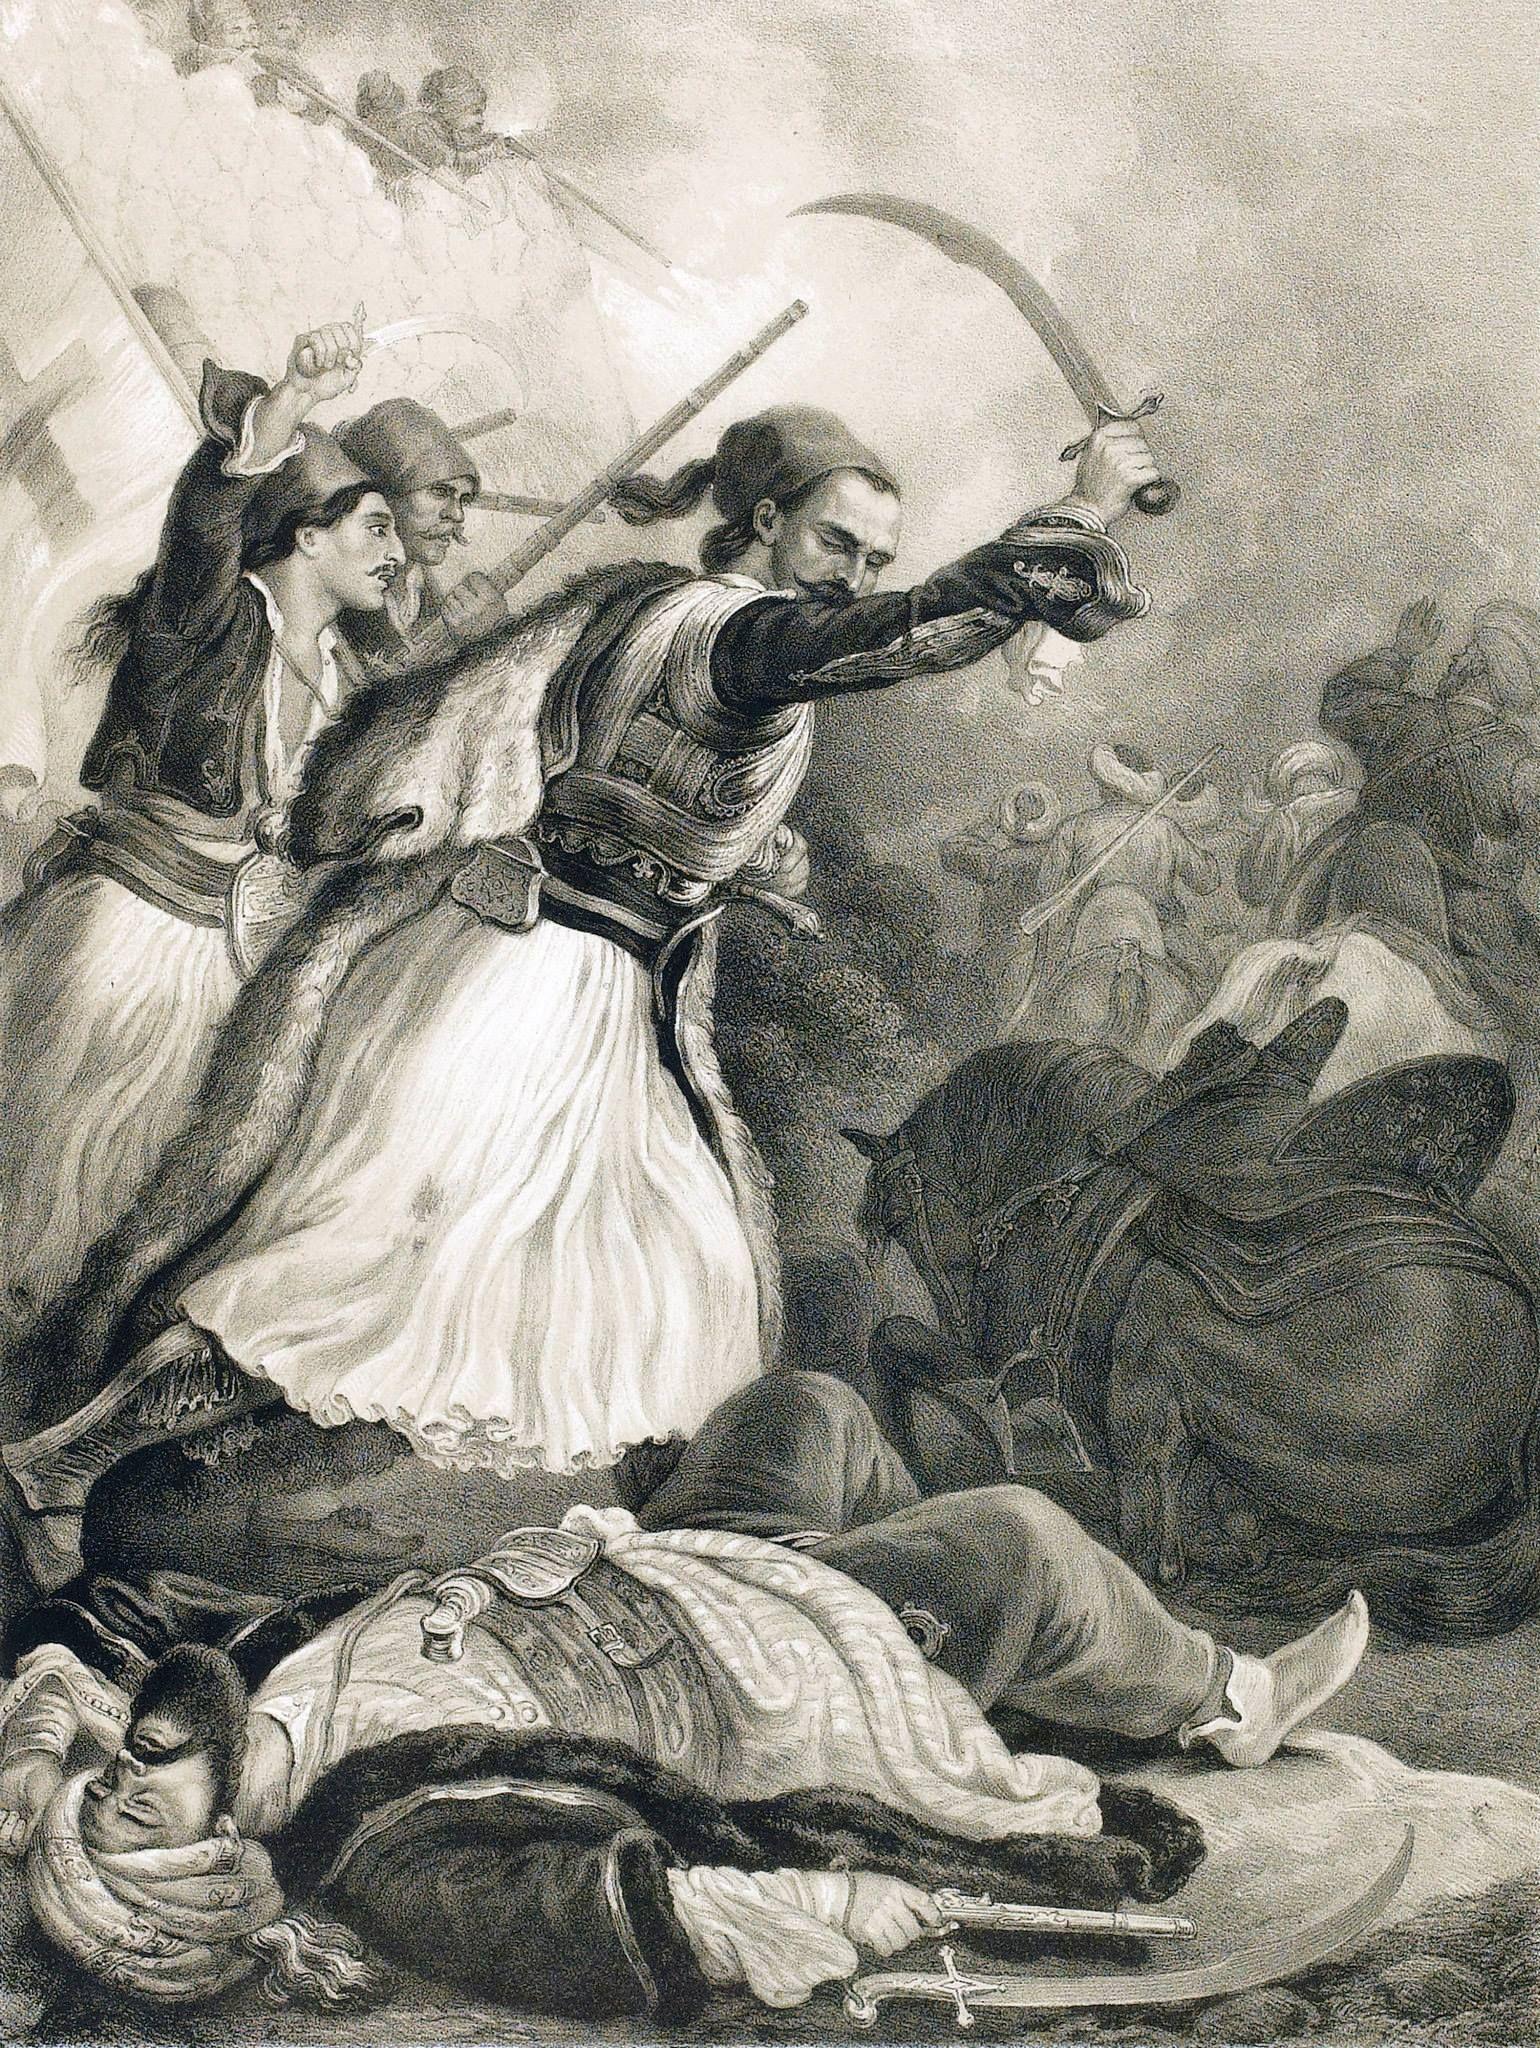 Peter Heinrich Lambert von Hess, περ. 1835, ο Αναγνωσταράς - Αναγνώστης  (Χρήστος) Παπαγεωργίου, νικά τους Τούρκους στη Μάχη του … | Greek  independence, History, Art